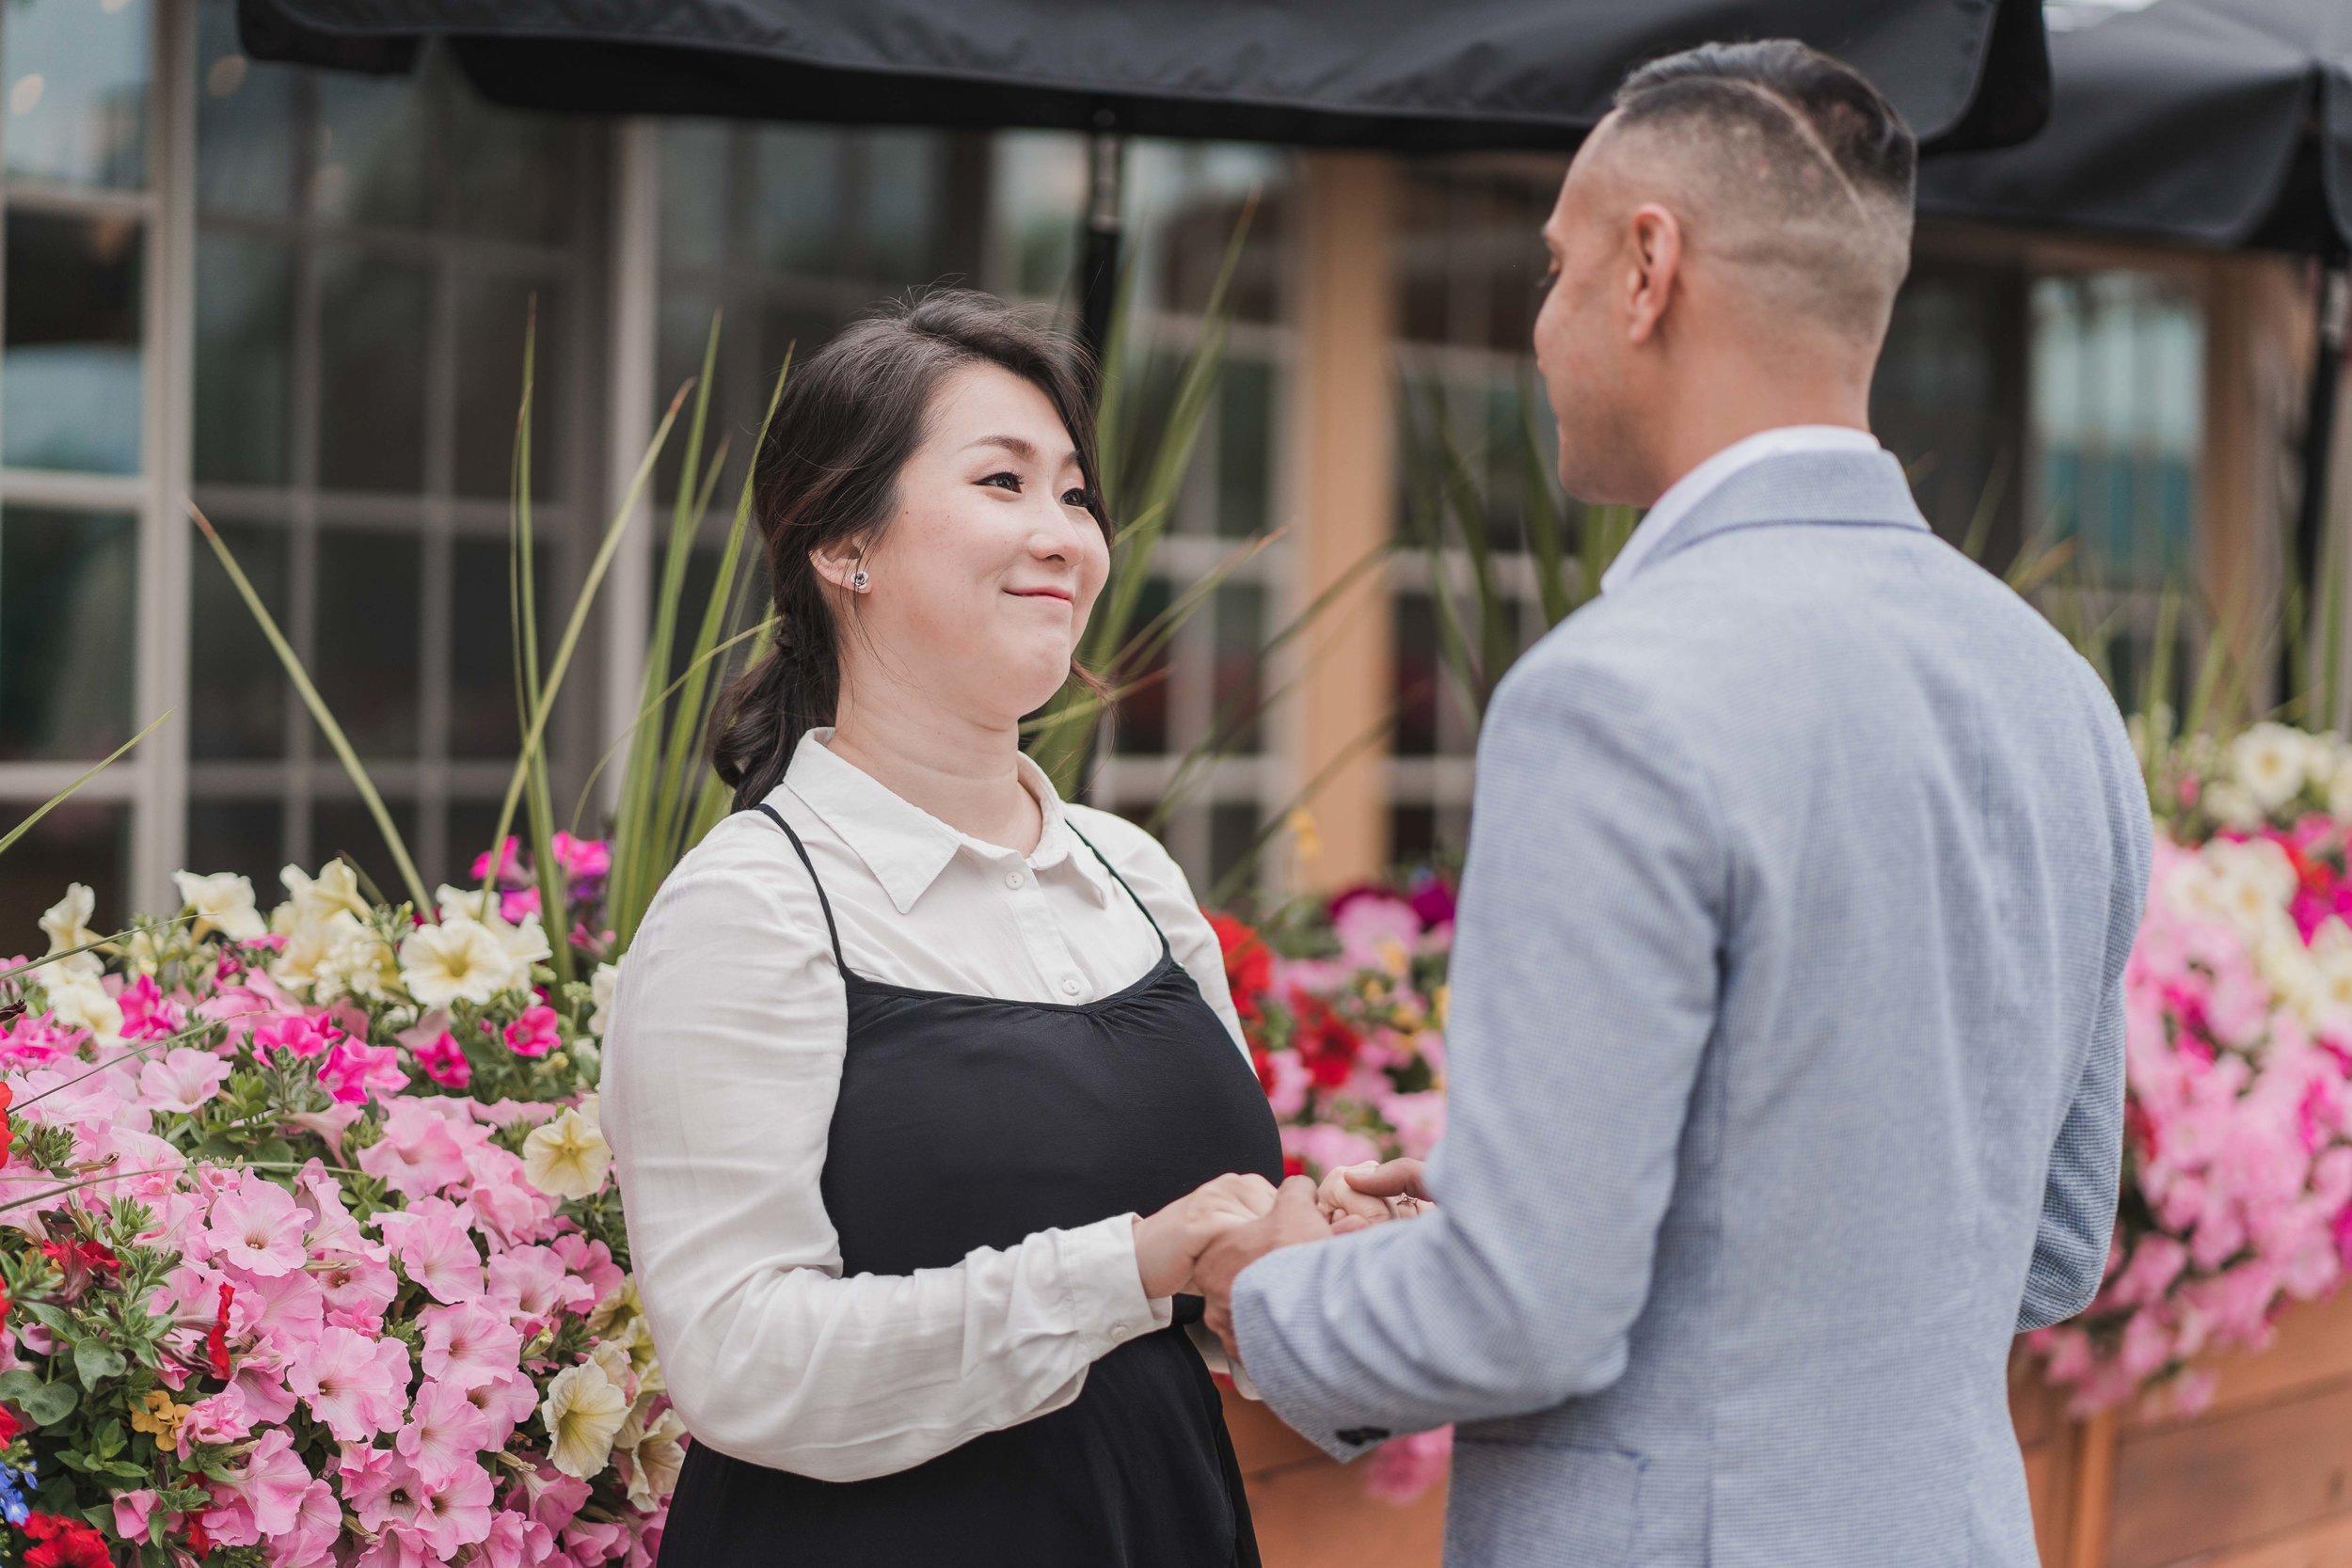 20190622 - Monika & Johnson Engagement - 0189.jpg